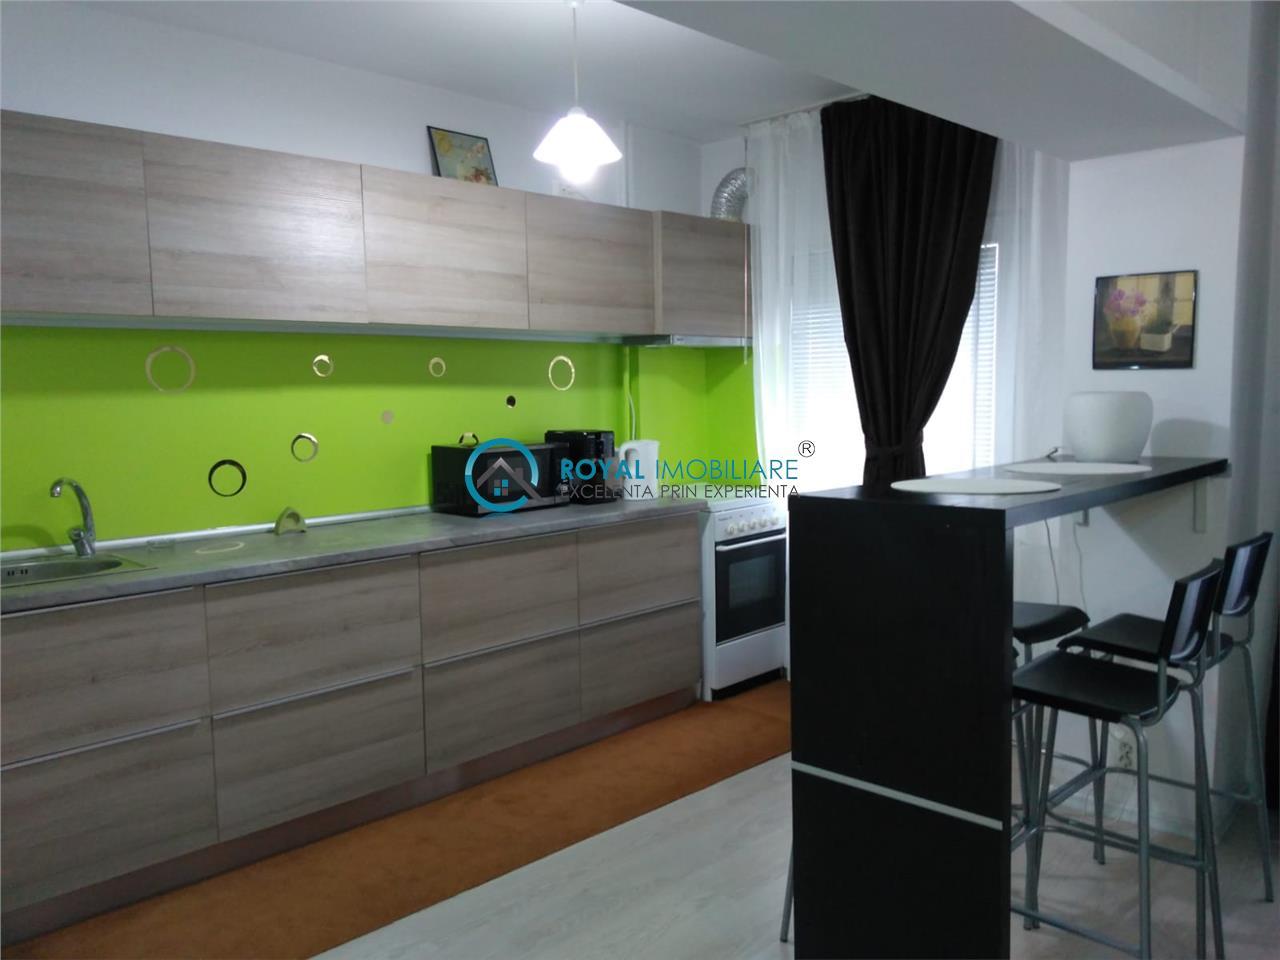 Royal Imobiliare   Inchirieri Apartamente B dul Bucuresti